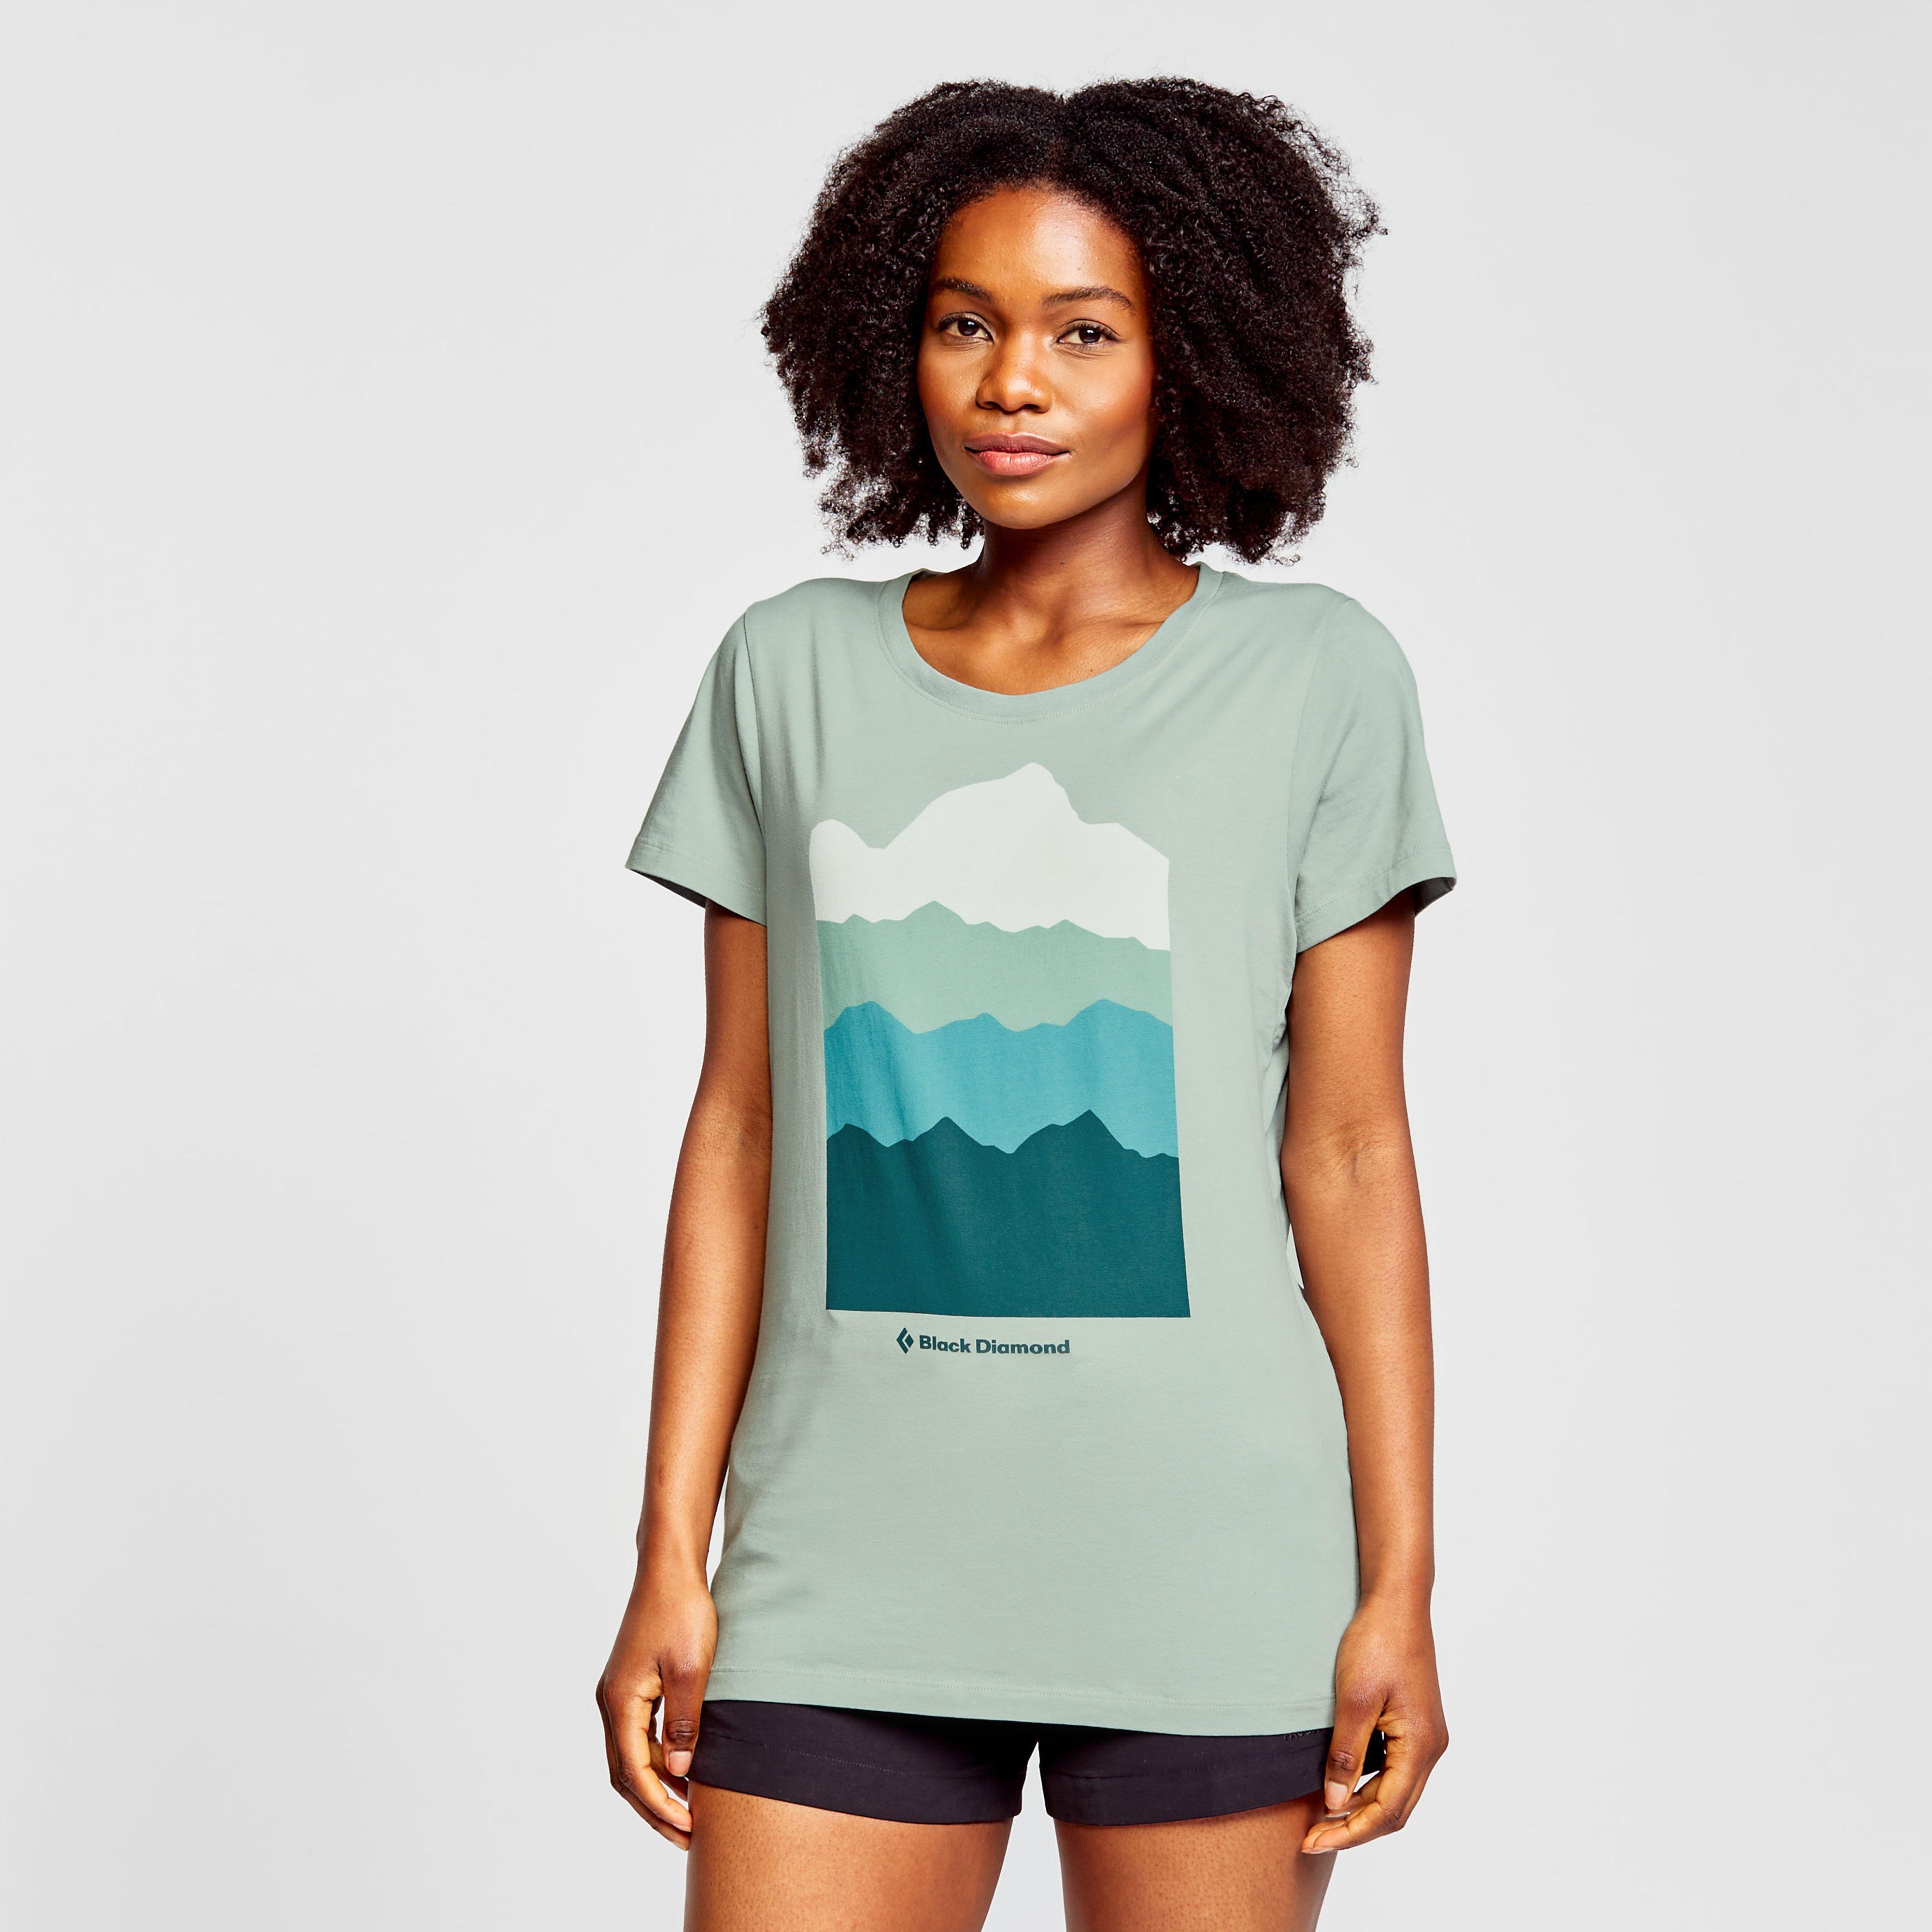 Black Diamond Womens Vista T-shirt - Lgy/lgy  Lgy/lgy